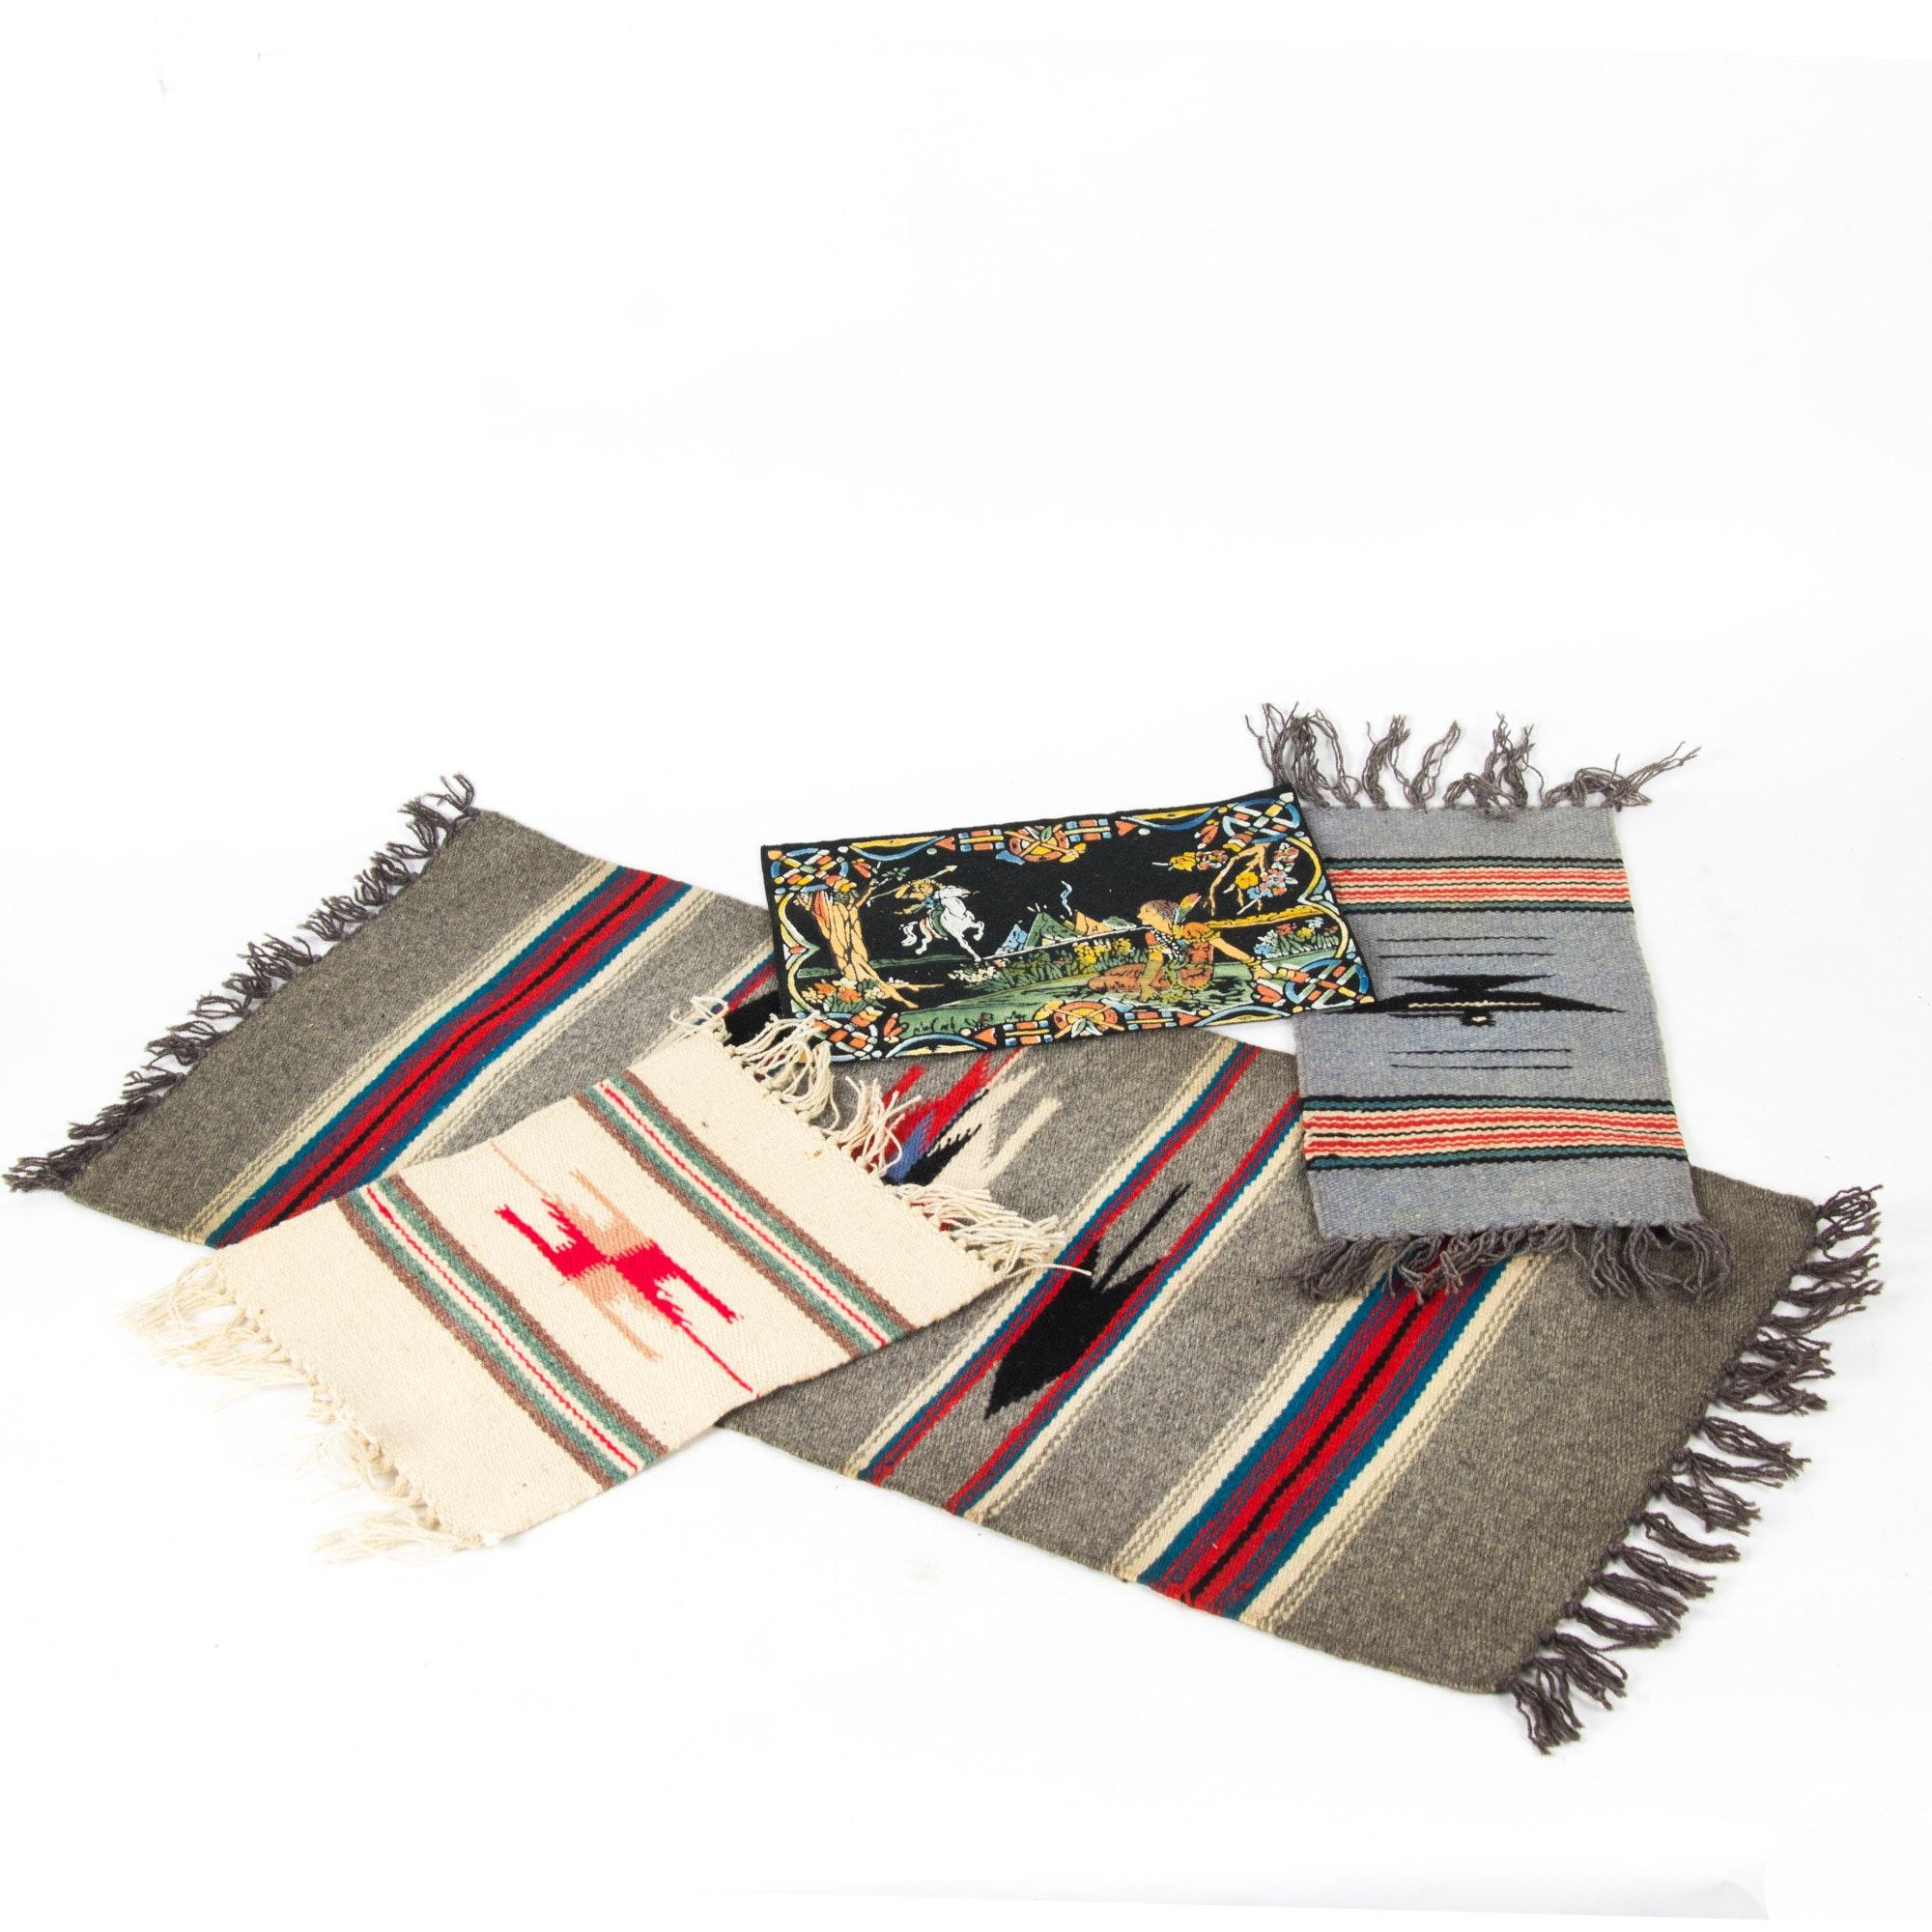 Assortment of Southwestern Themed Textiles